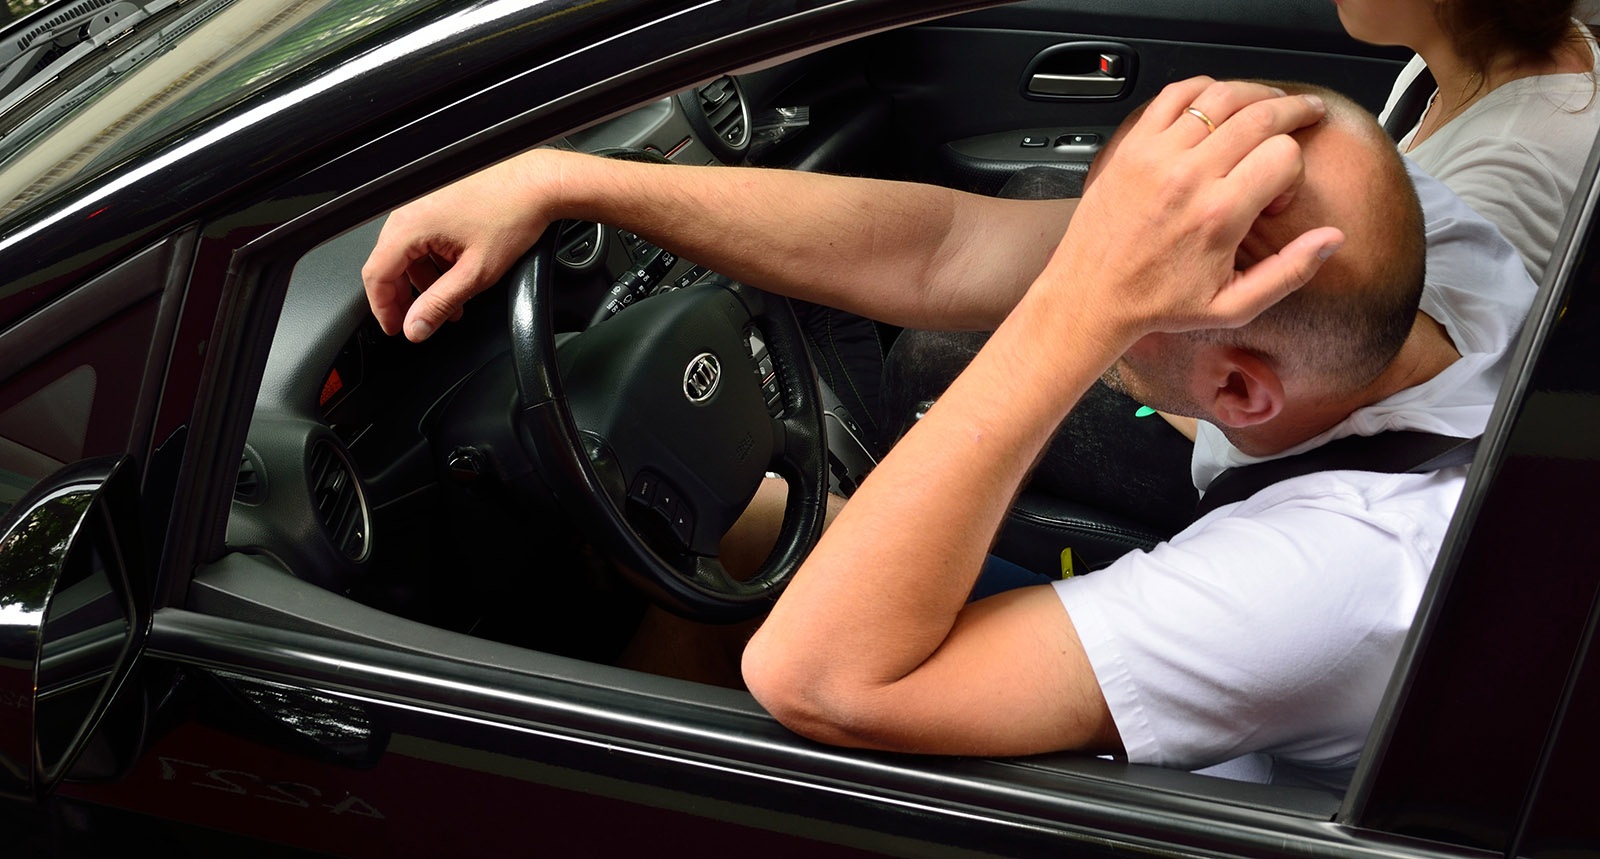 Don't let One Bad Driver Destroy Your Image